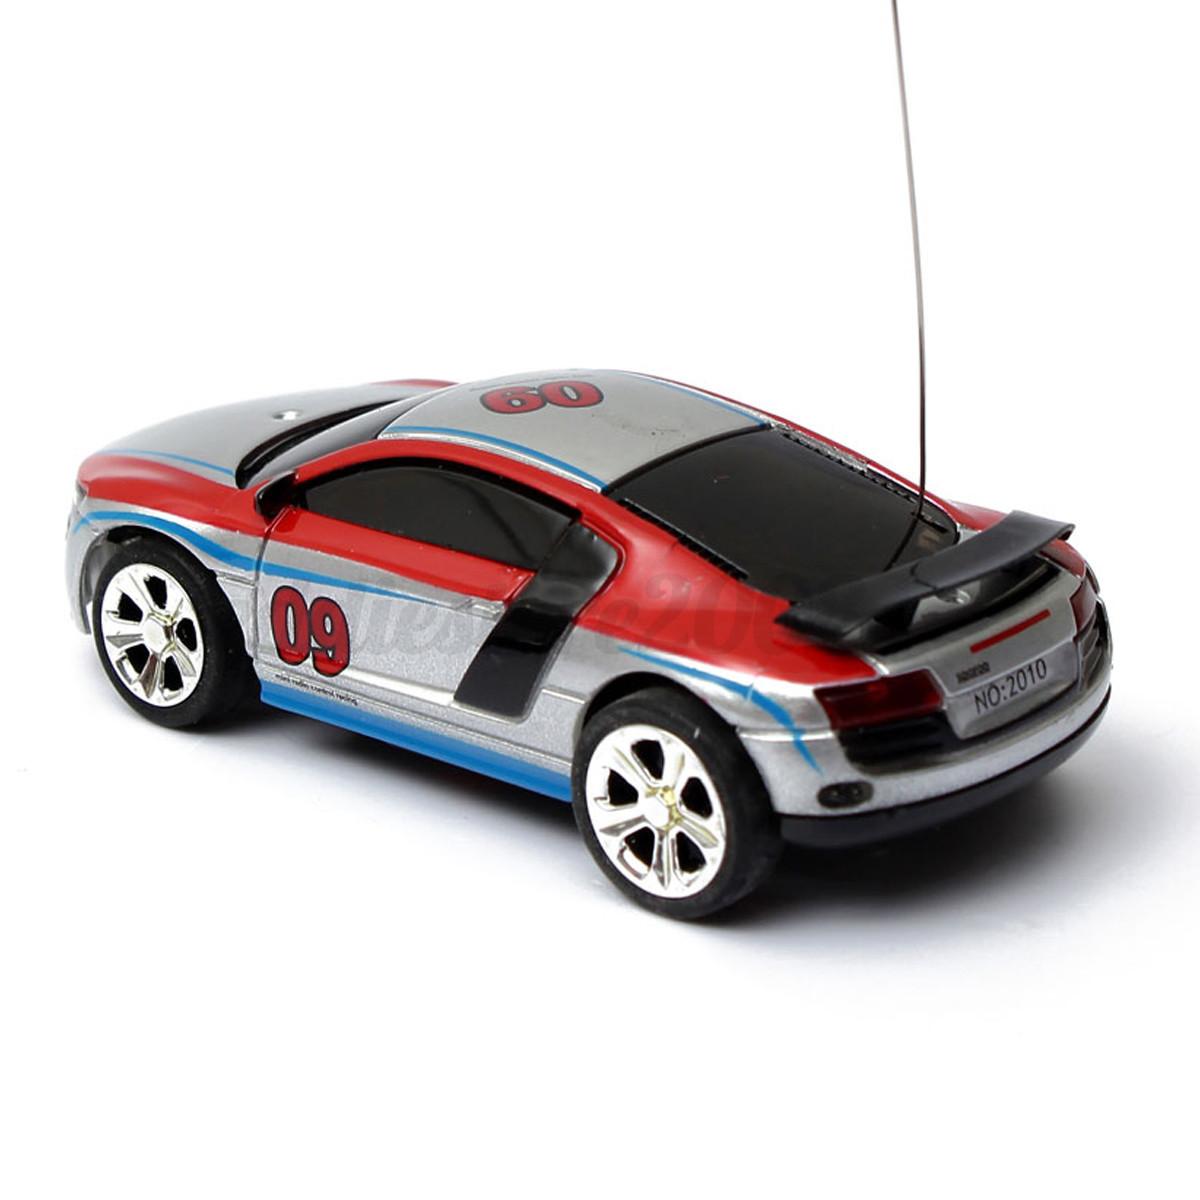 Mini Radio Remote Control RC Racing Car Toy Vehicle Coke